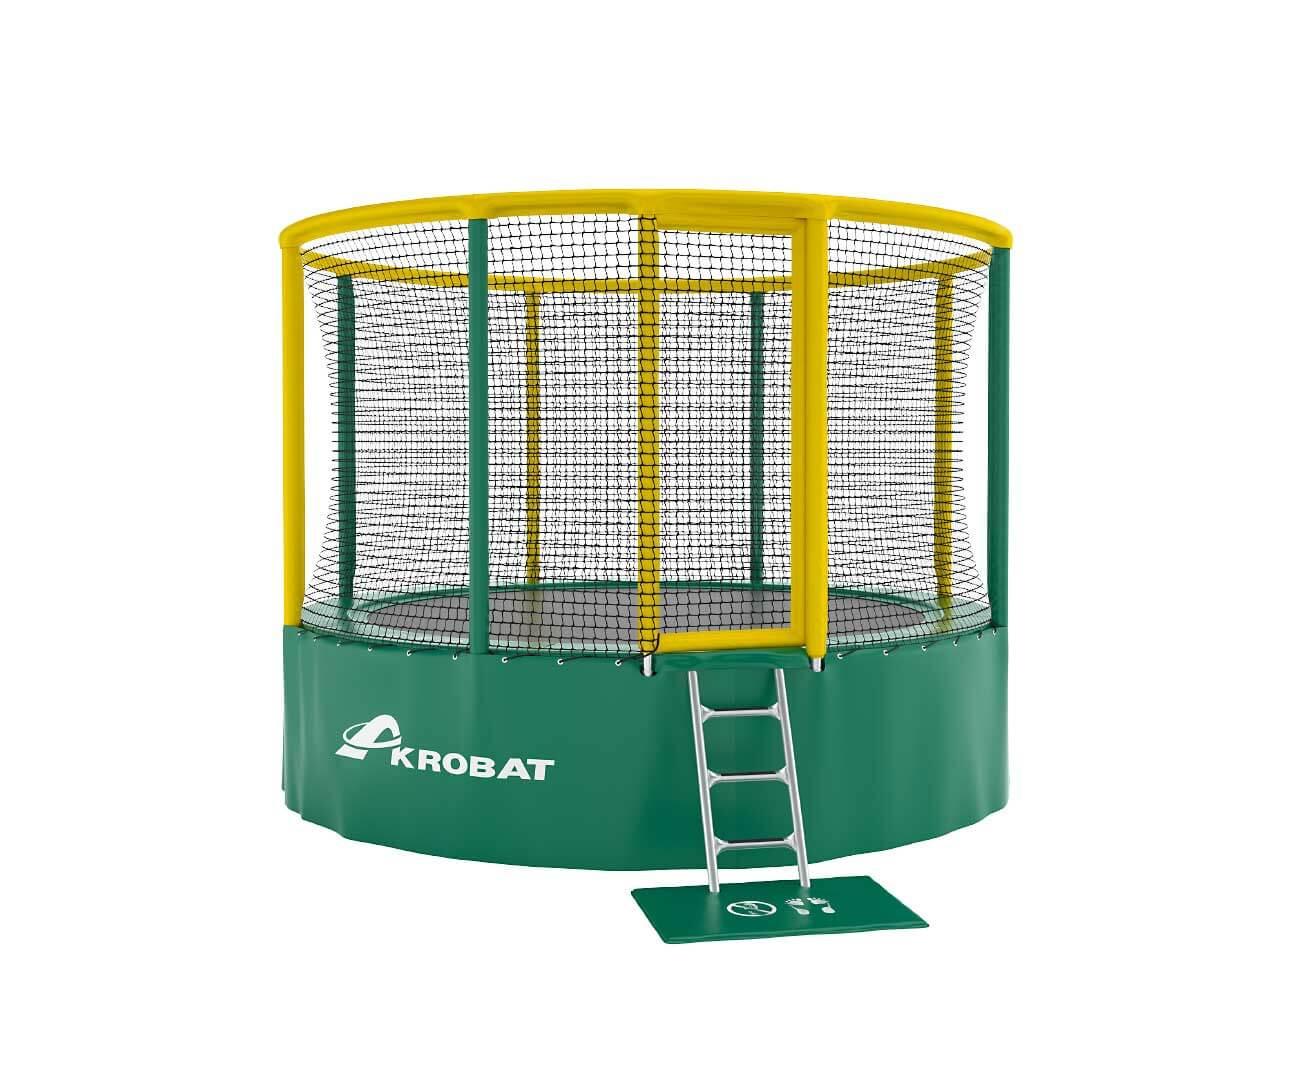 Akrobat Gallus 12 Green-yellow enclosure / Green safety pad /Black jumping mat